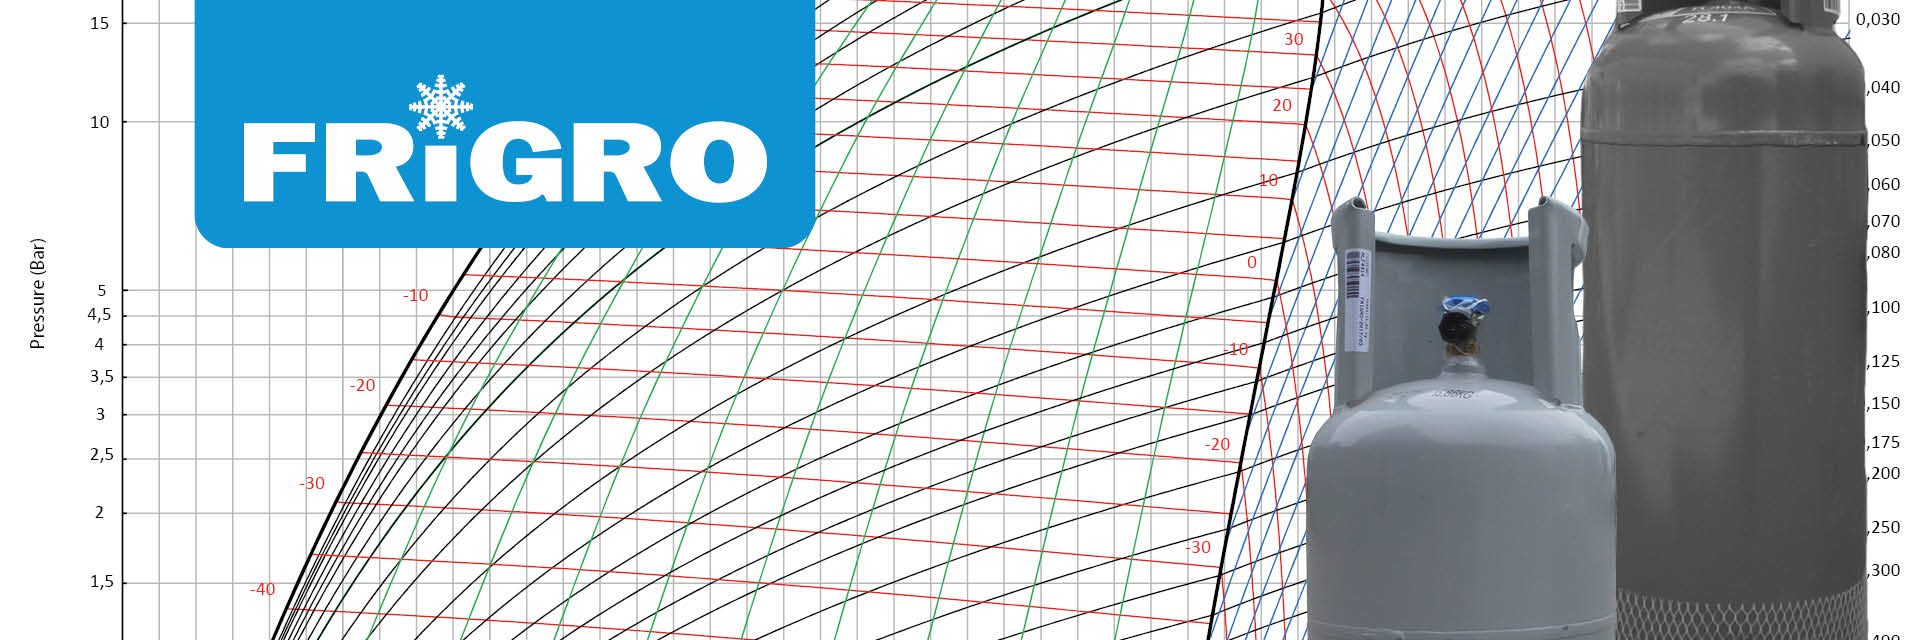 Frigro Training Center: opleiding werken met koelmiddelen met glides